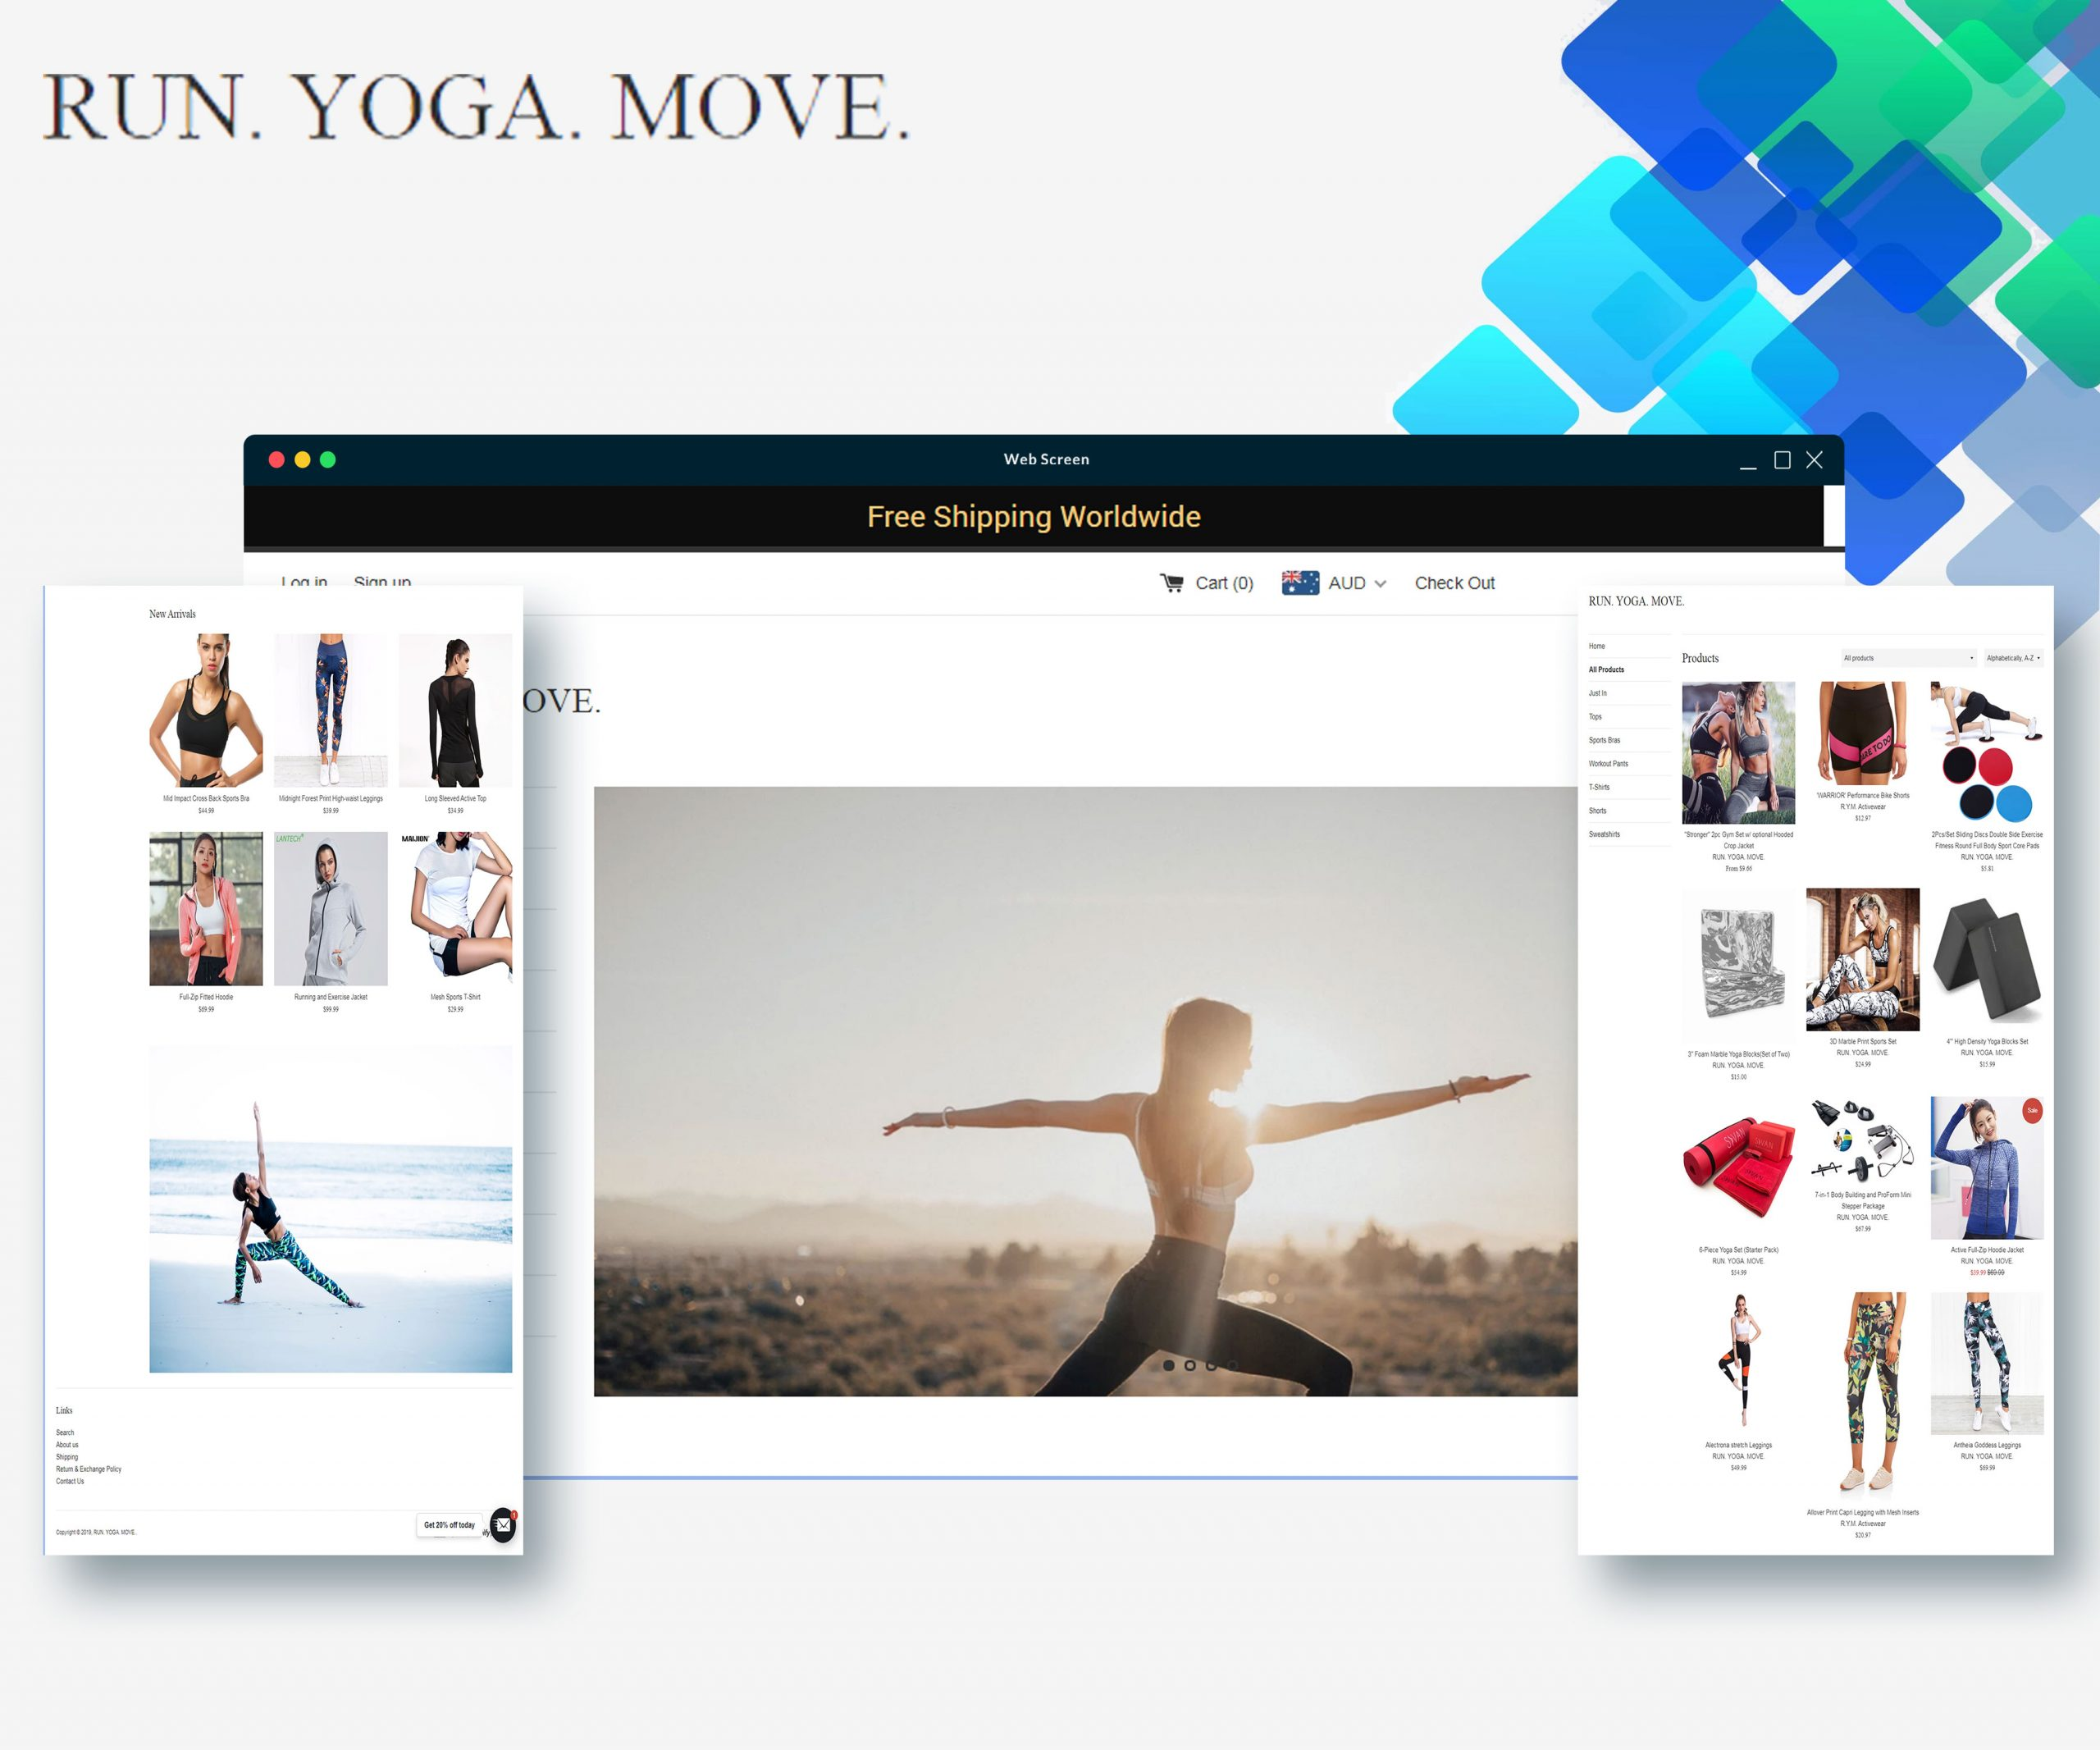 Run-Yoga-Move